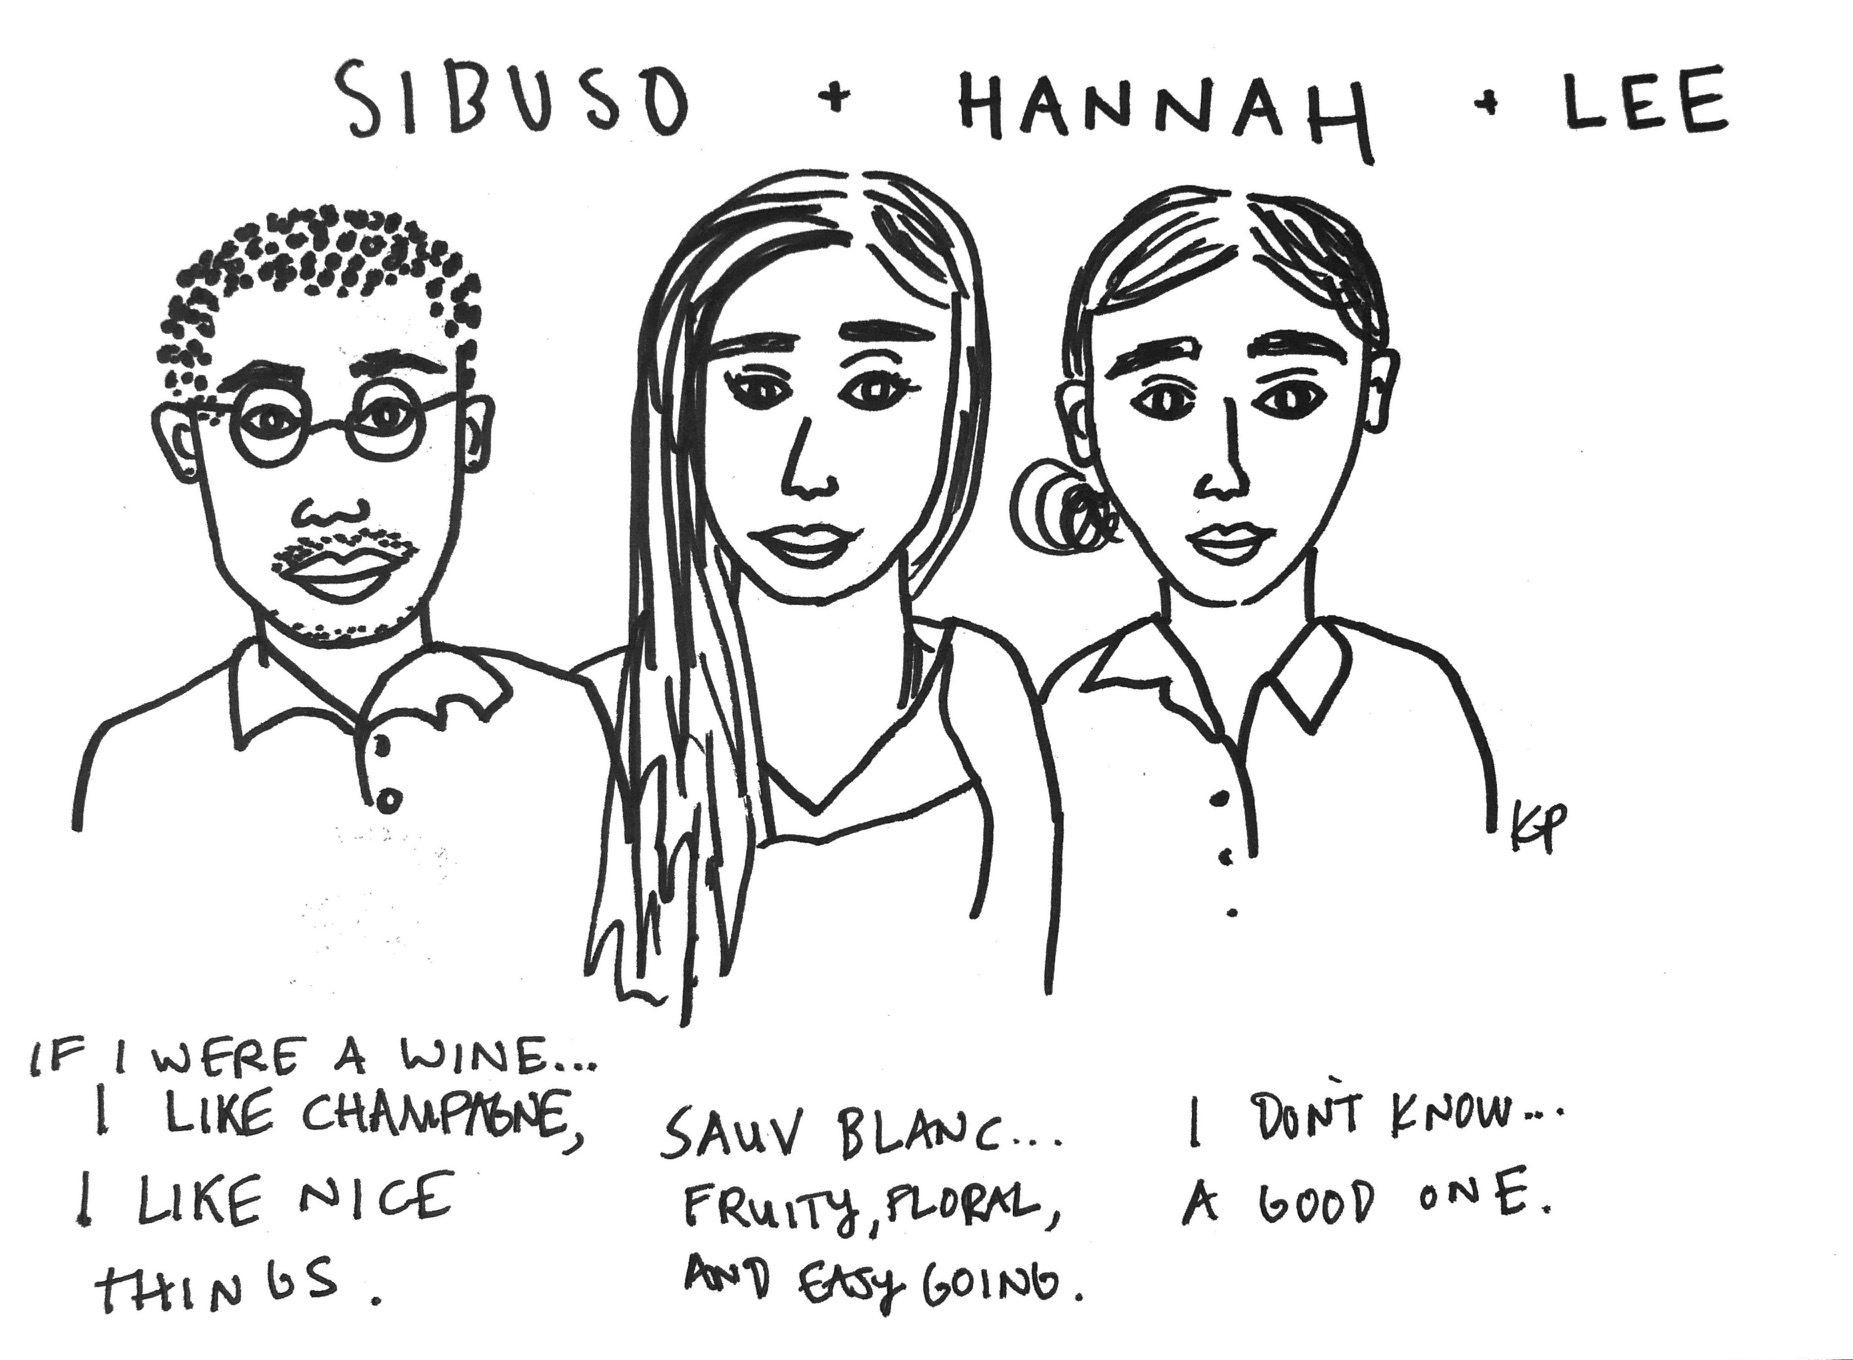 Sibuso + Hannah + Lee.jpg